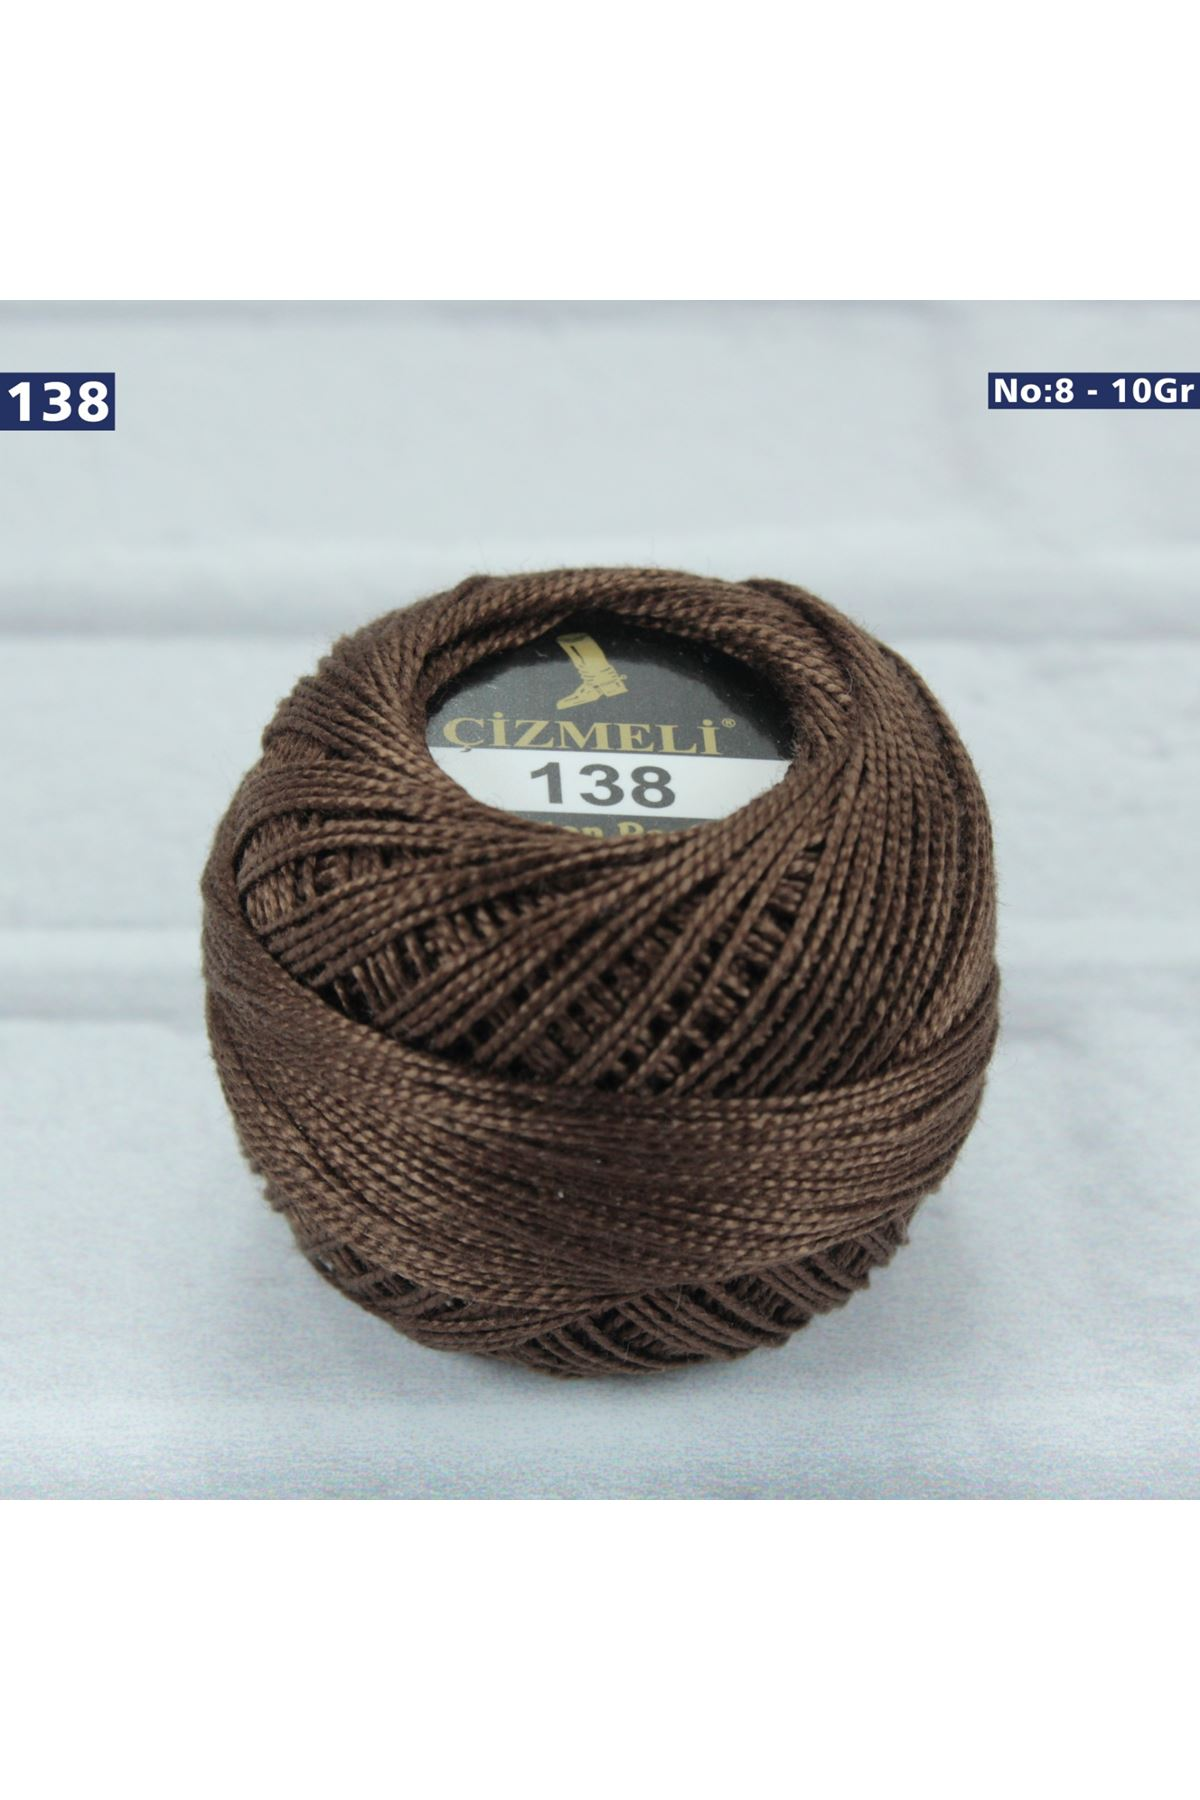 Çizmeli Cotton Perle Nakış İpliği No: 138